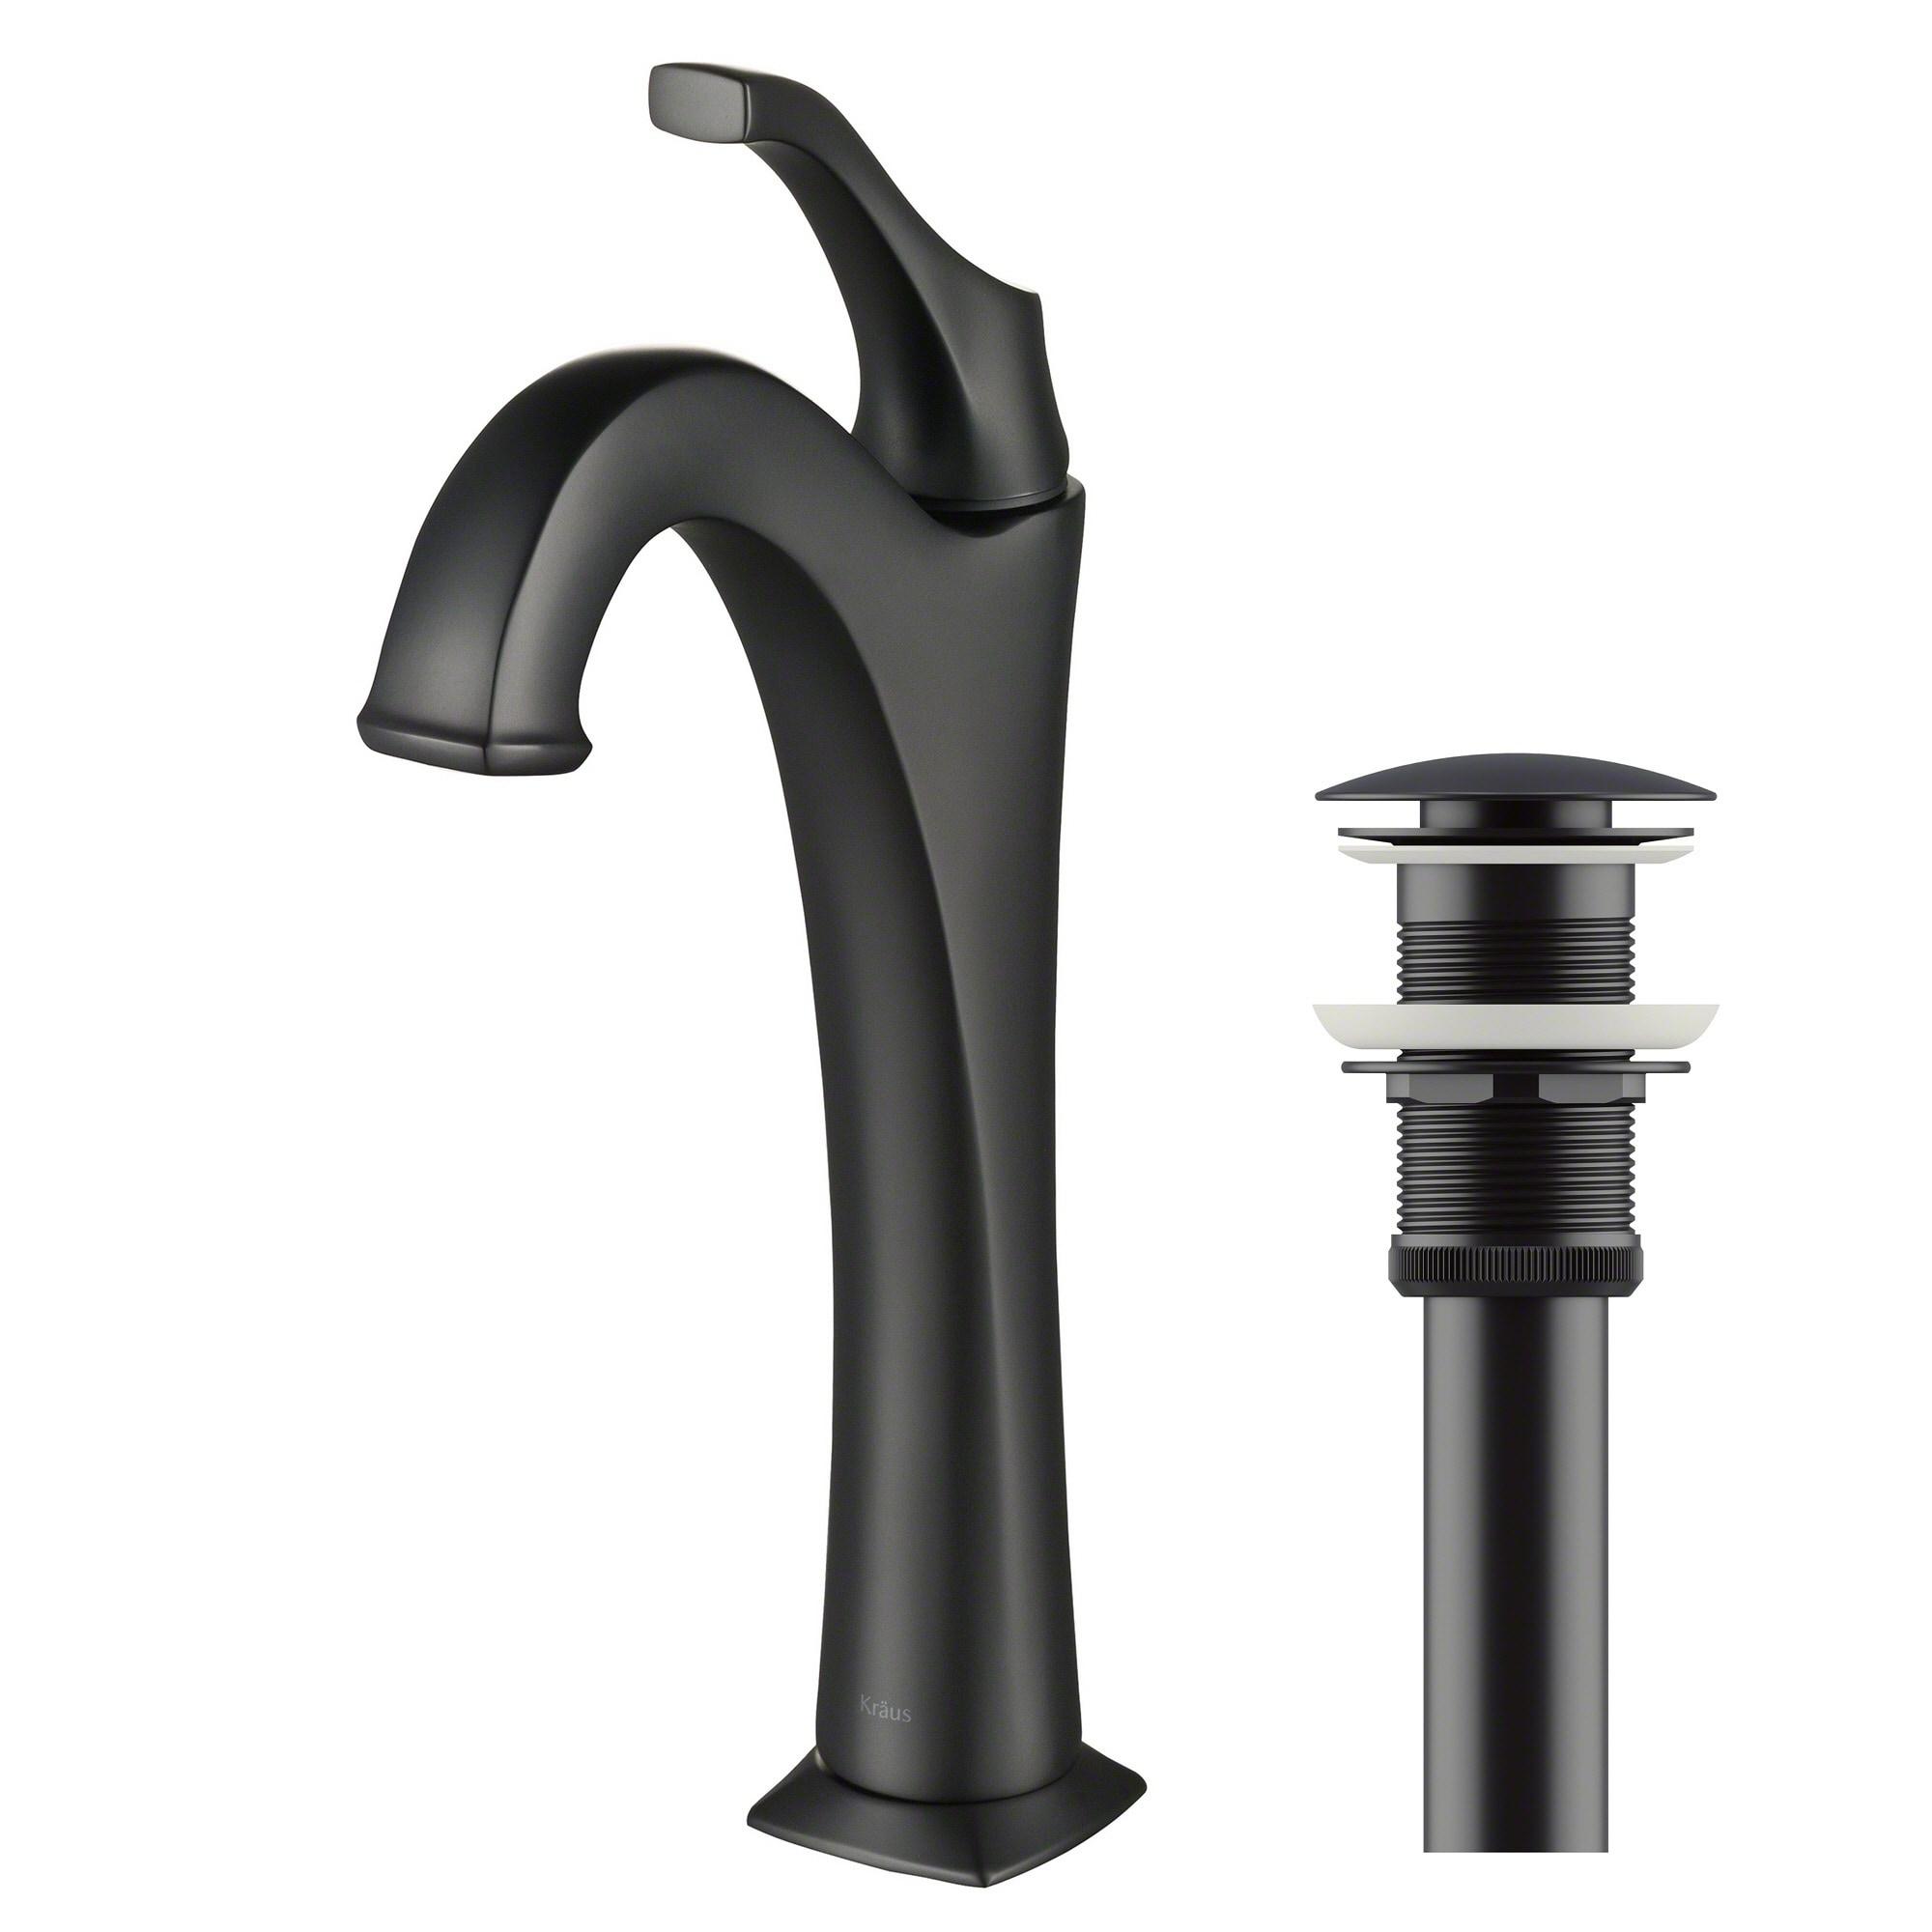 Kraus KVF 1200 Arlo Single Hole Single Handle Bathroom Vessel Faucet With  Drain Assembly